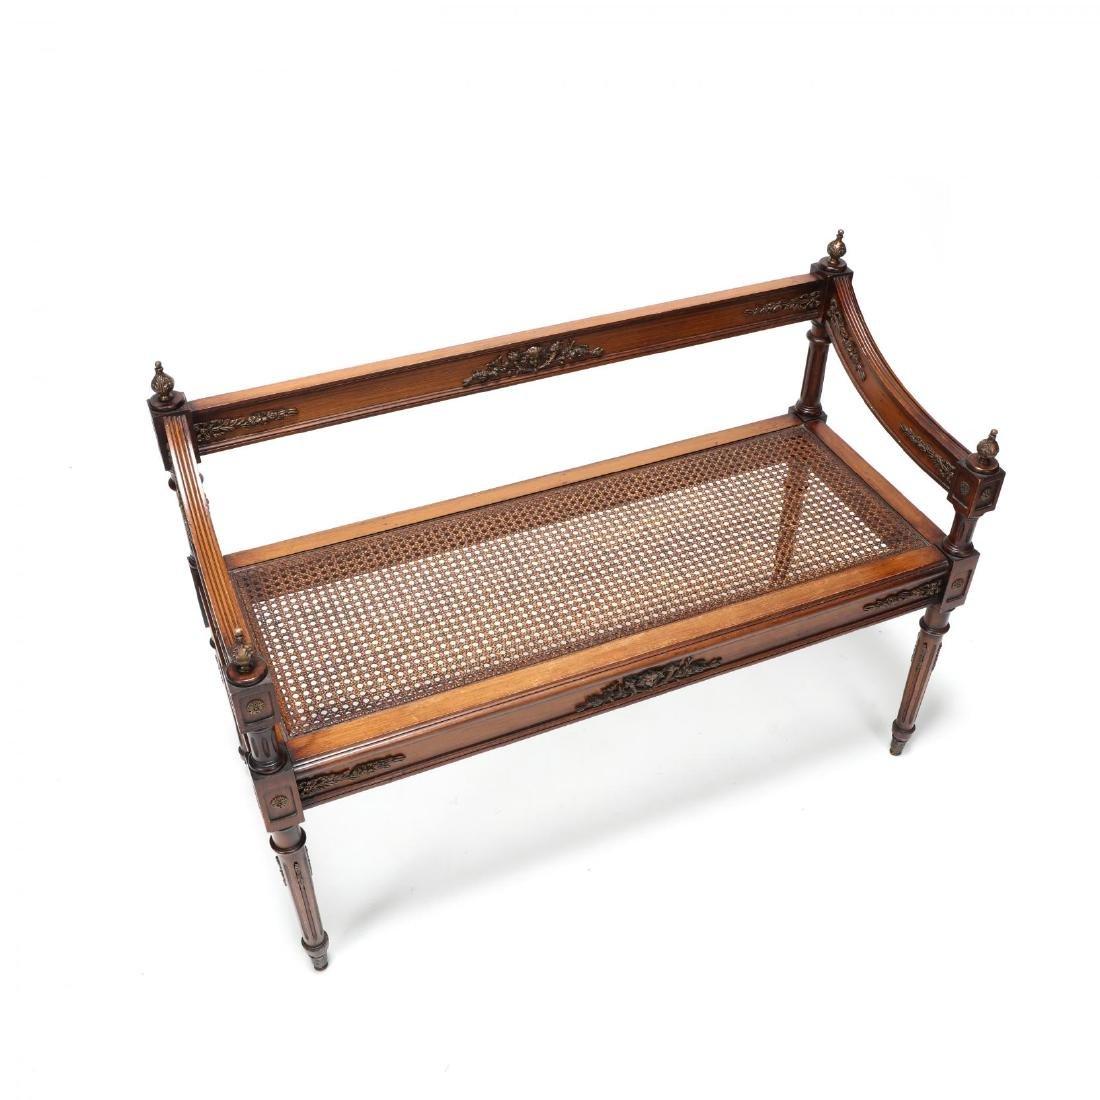 Louis XVI Style Cane Seat Settee - 2